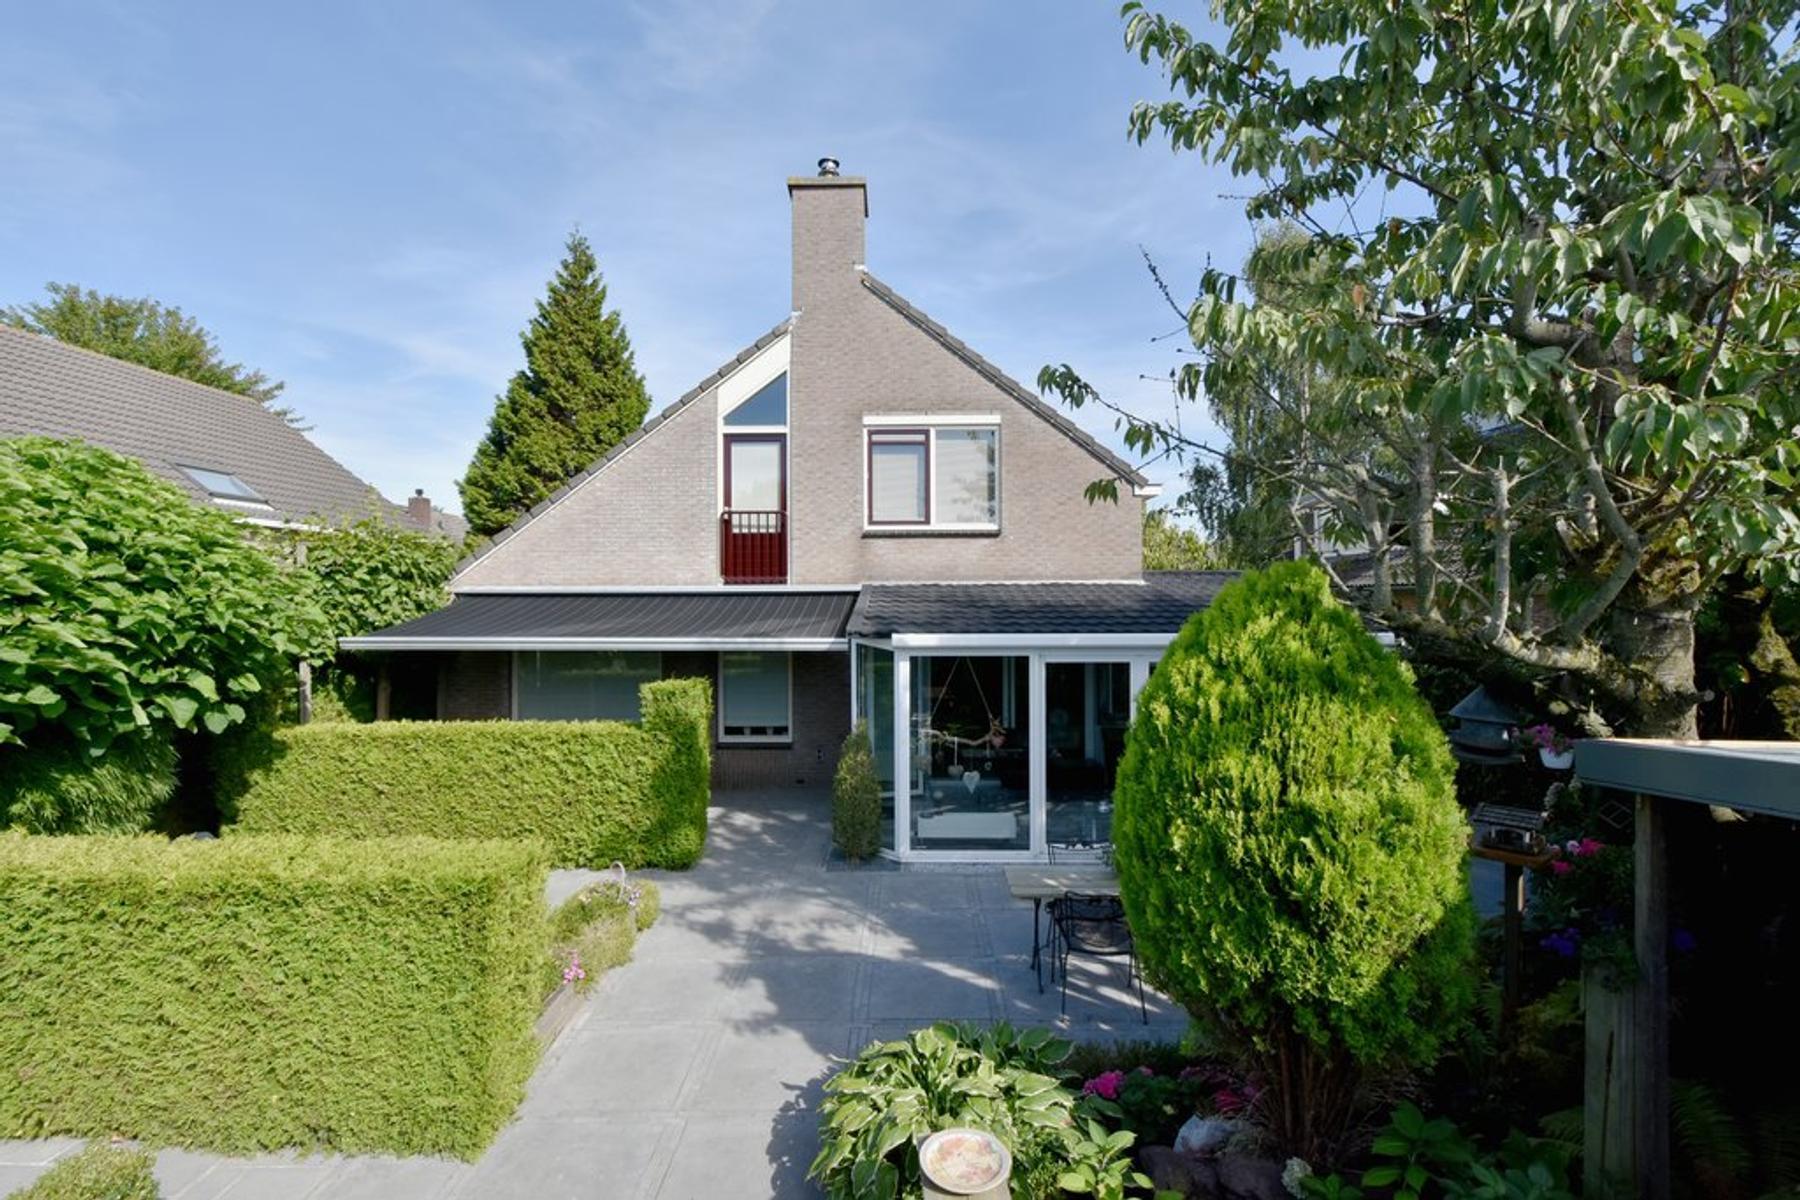 Bunschotenstraat 10 in Almere 1324 PD